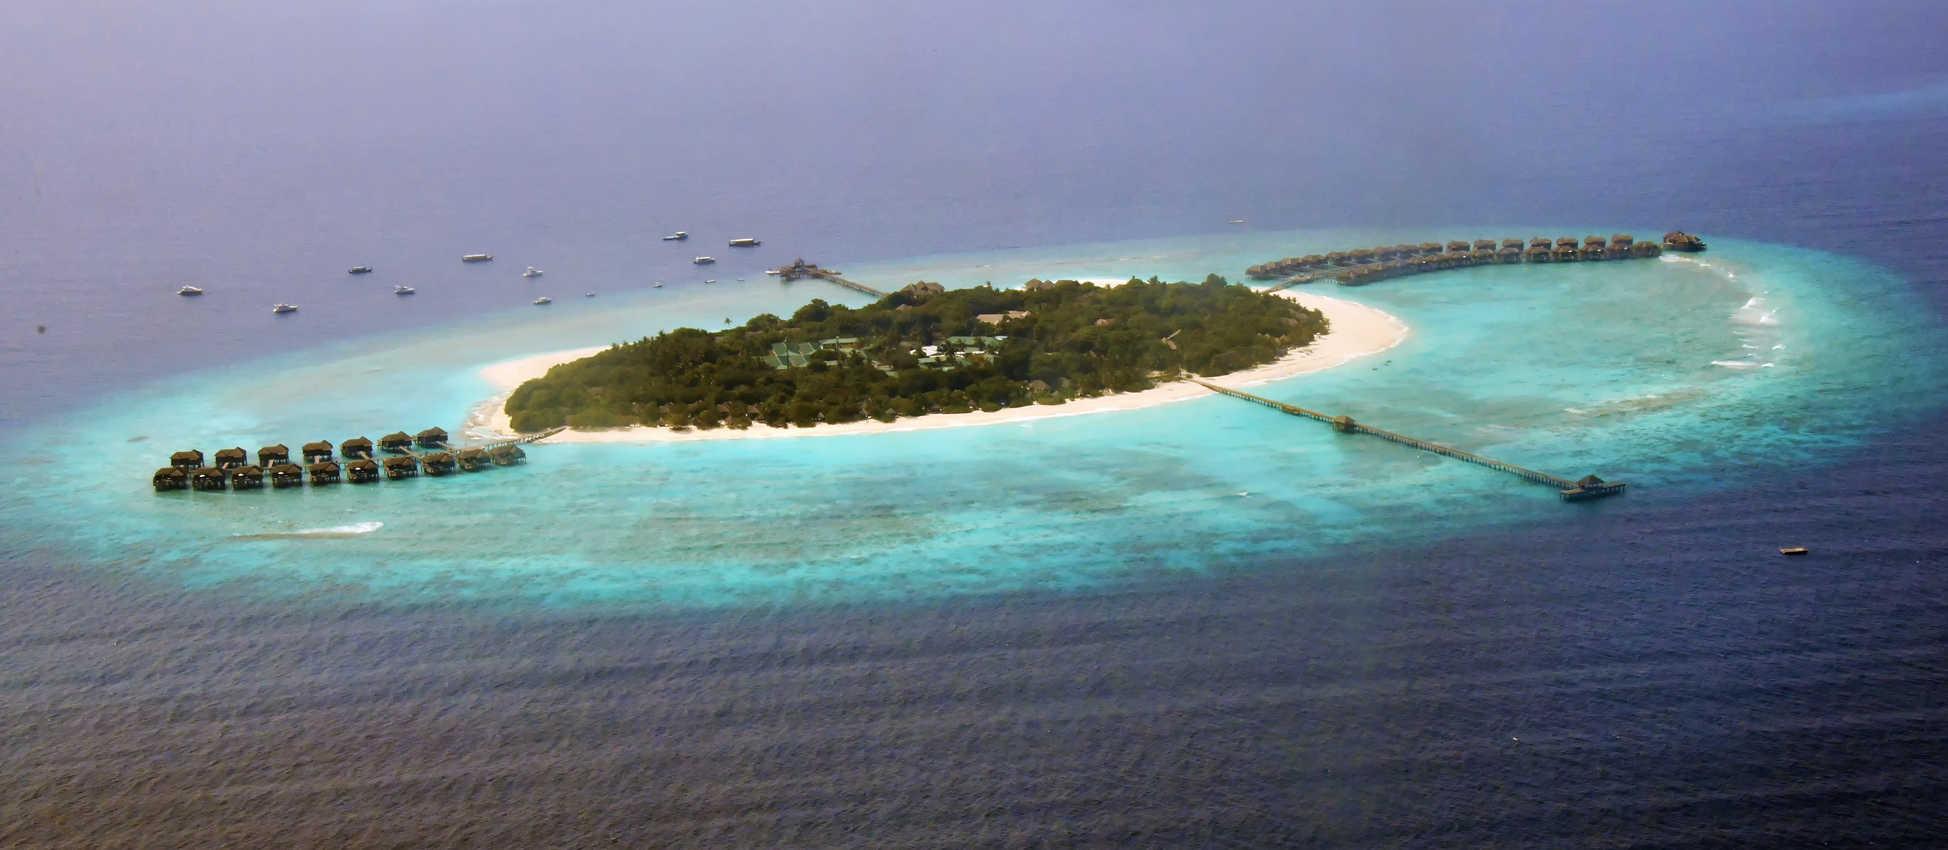 Seaplane view of J A Manafaru resort